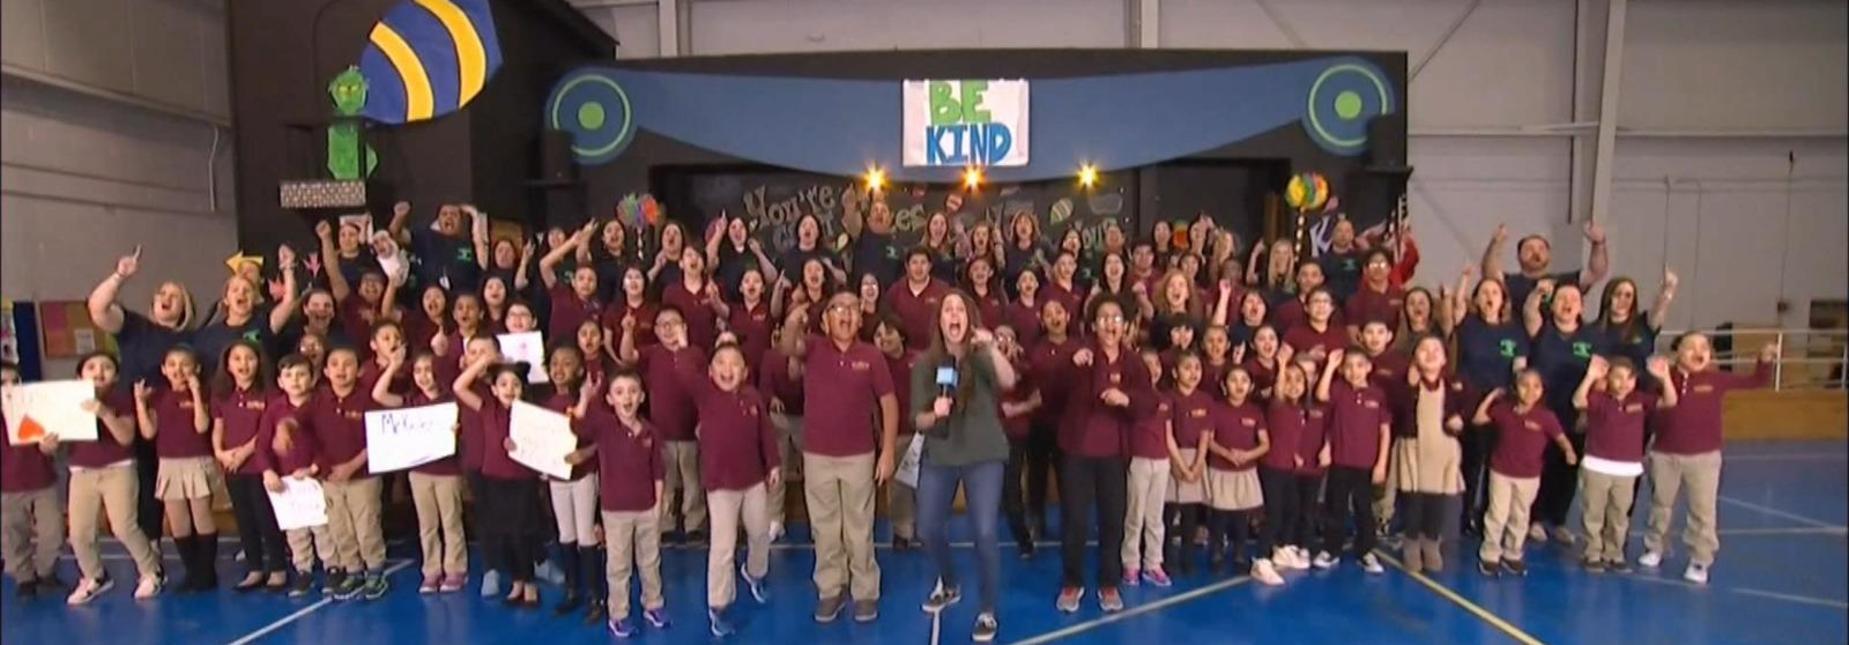 cheering students on the Ellen Show